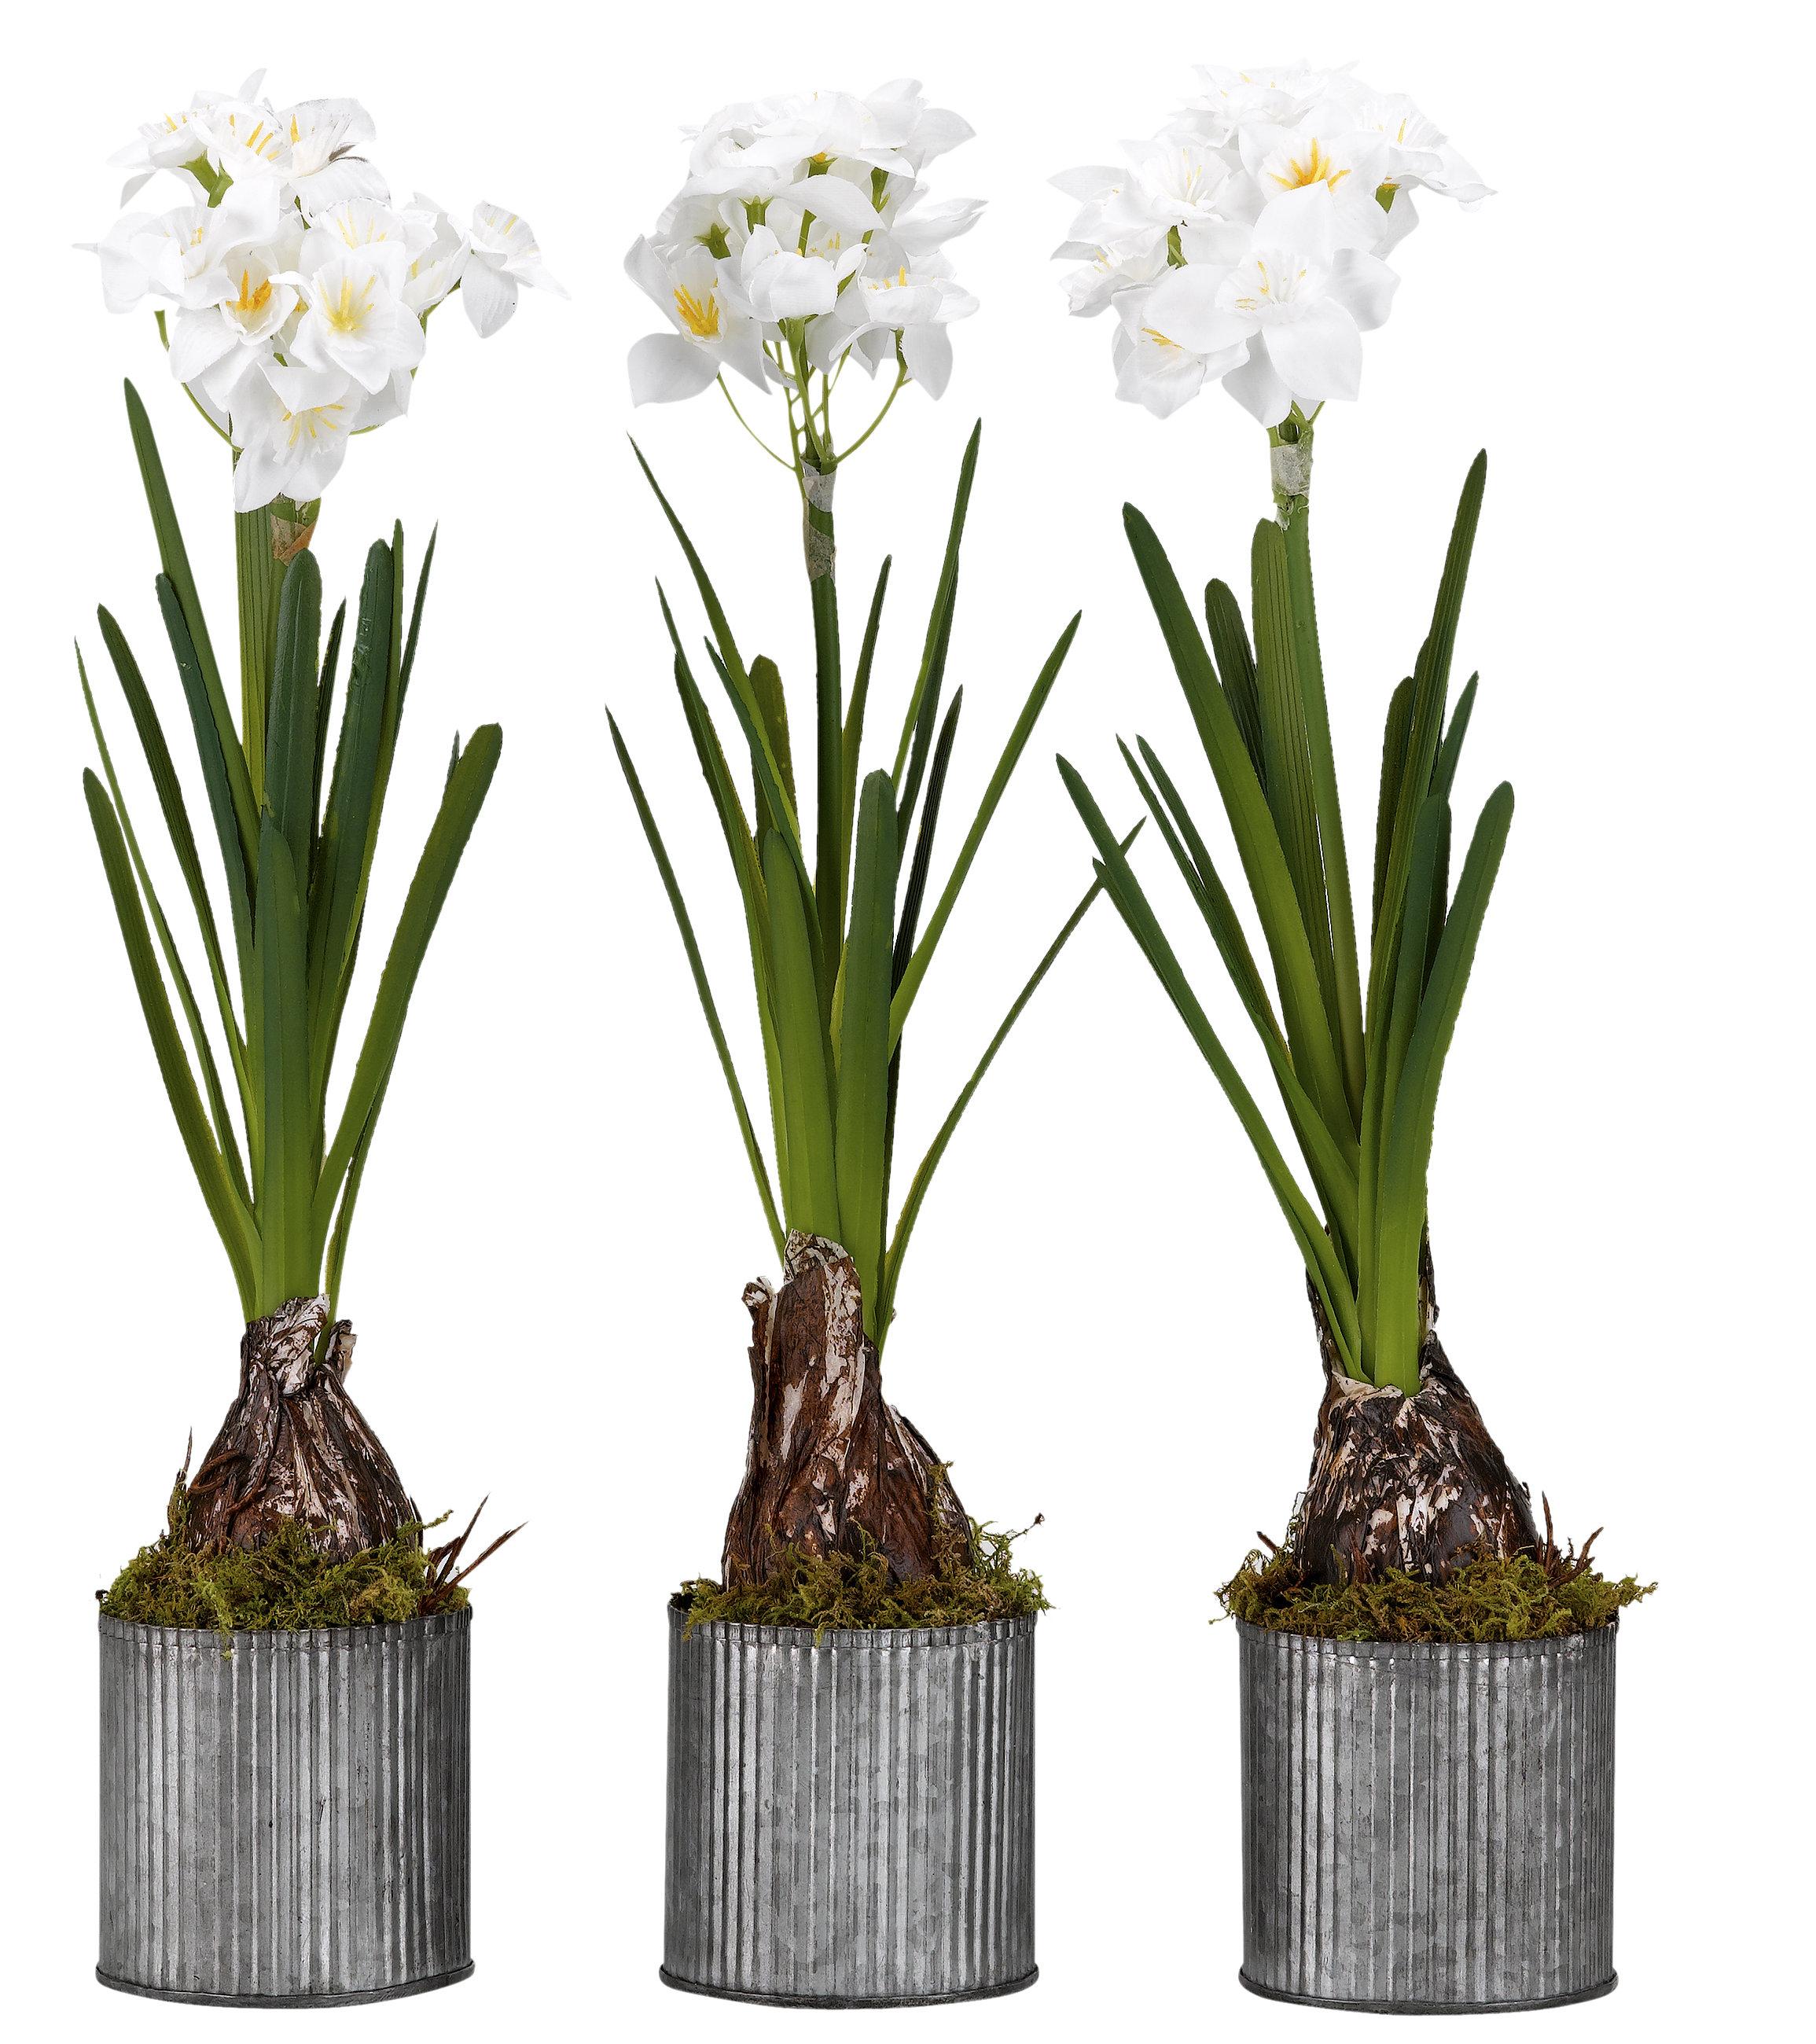 Gracie Oaks Paperwhite Bulbs Floor Flowering Plant In Tin Planter Set Wayfair